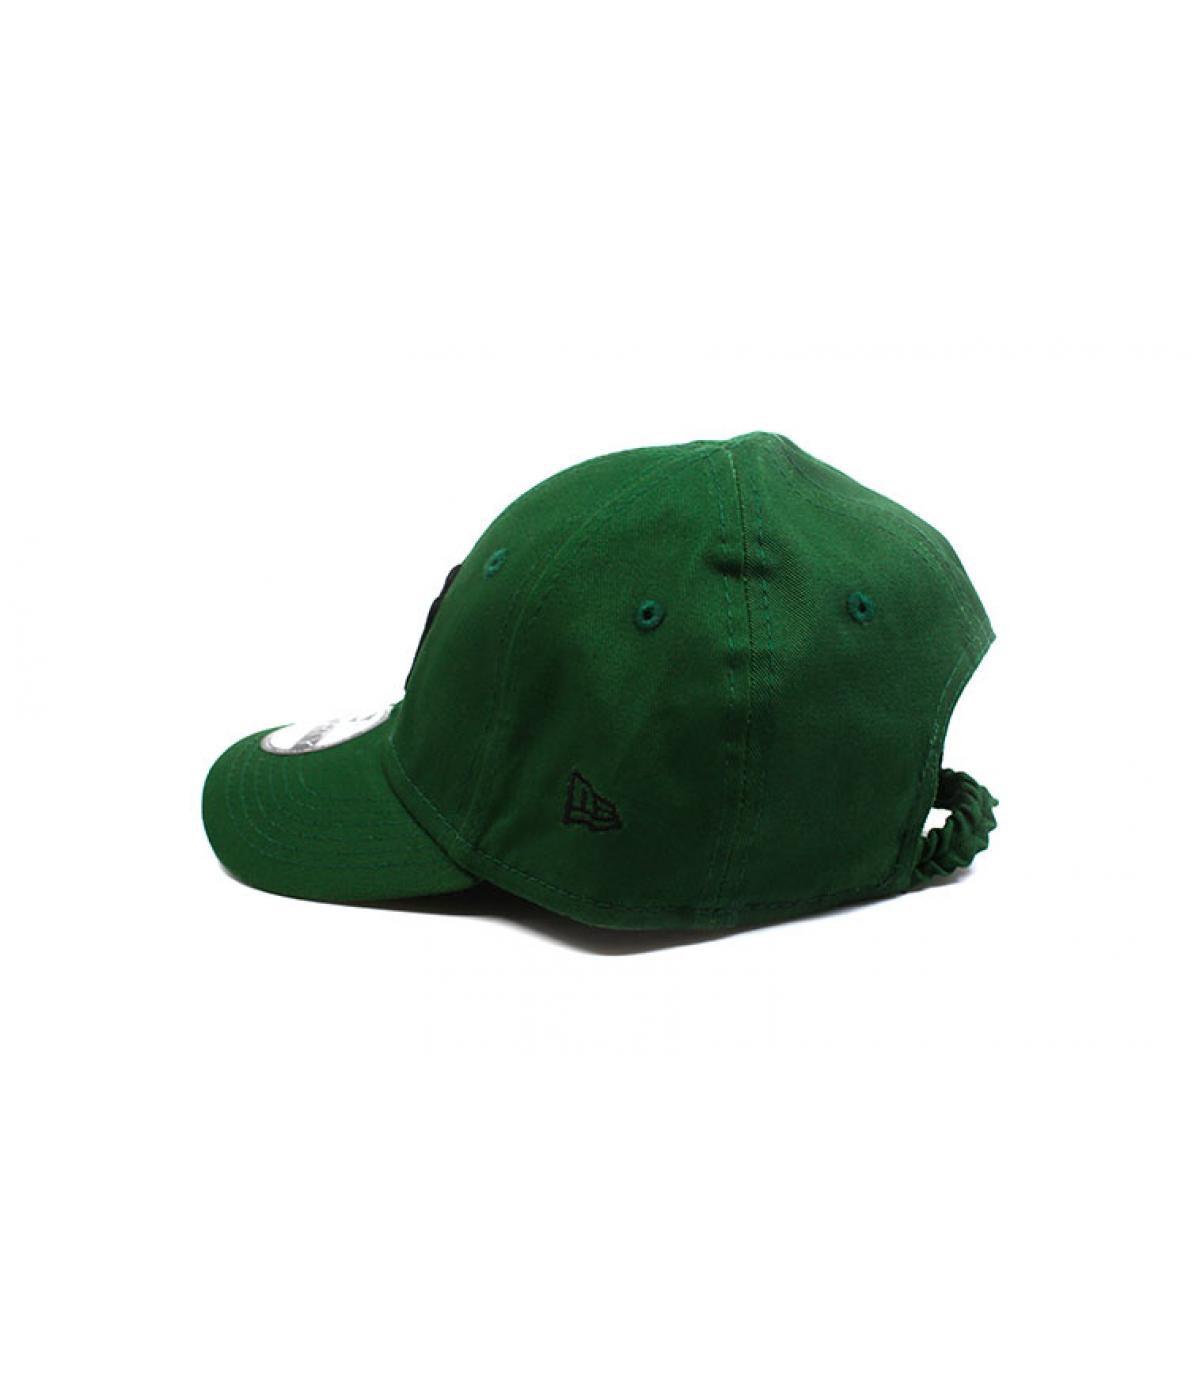 Details Infant League Ess NY green black - afbeeling 4